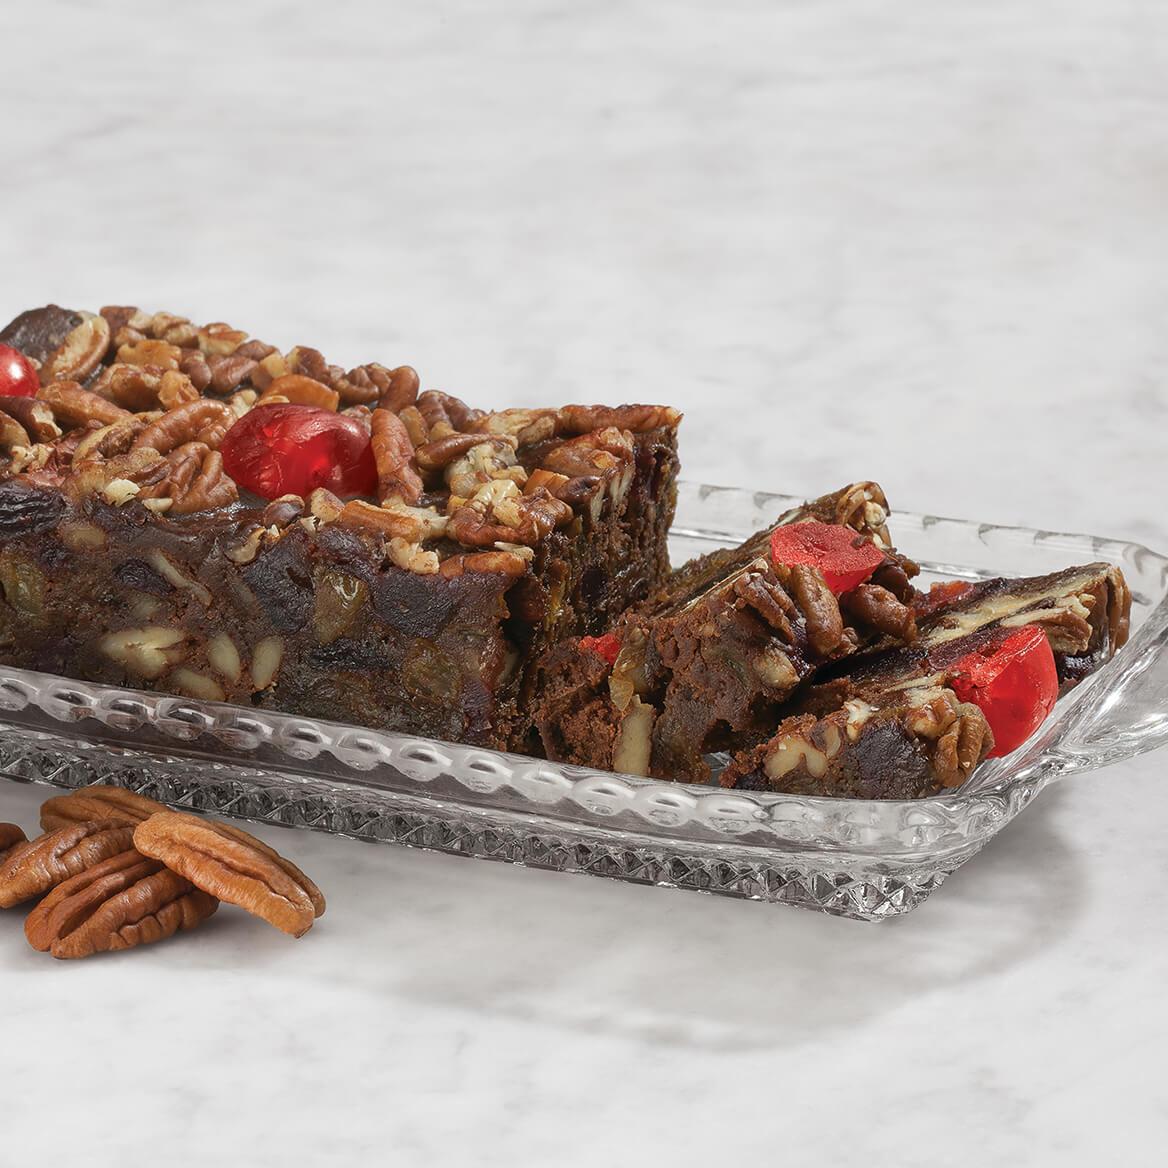 Chocolate Fruit and Nut Cake, 16 oz.-364595